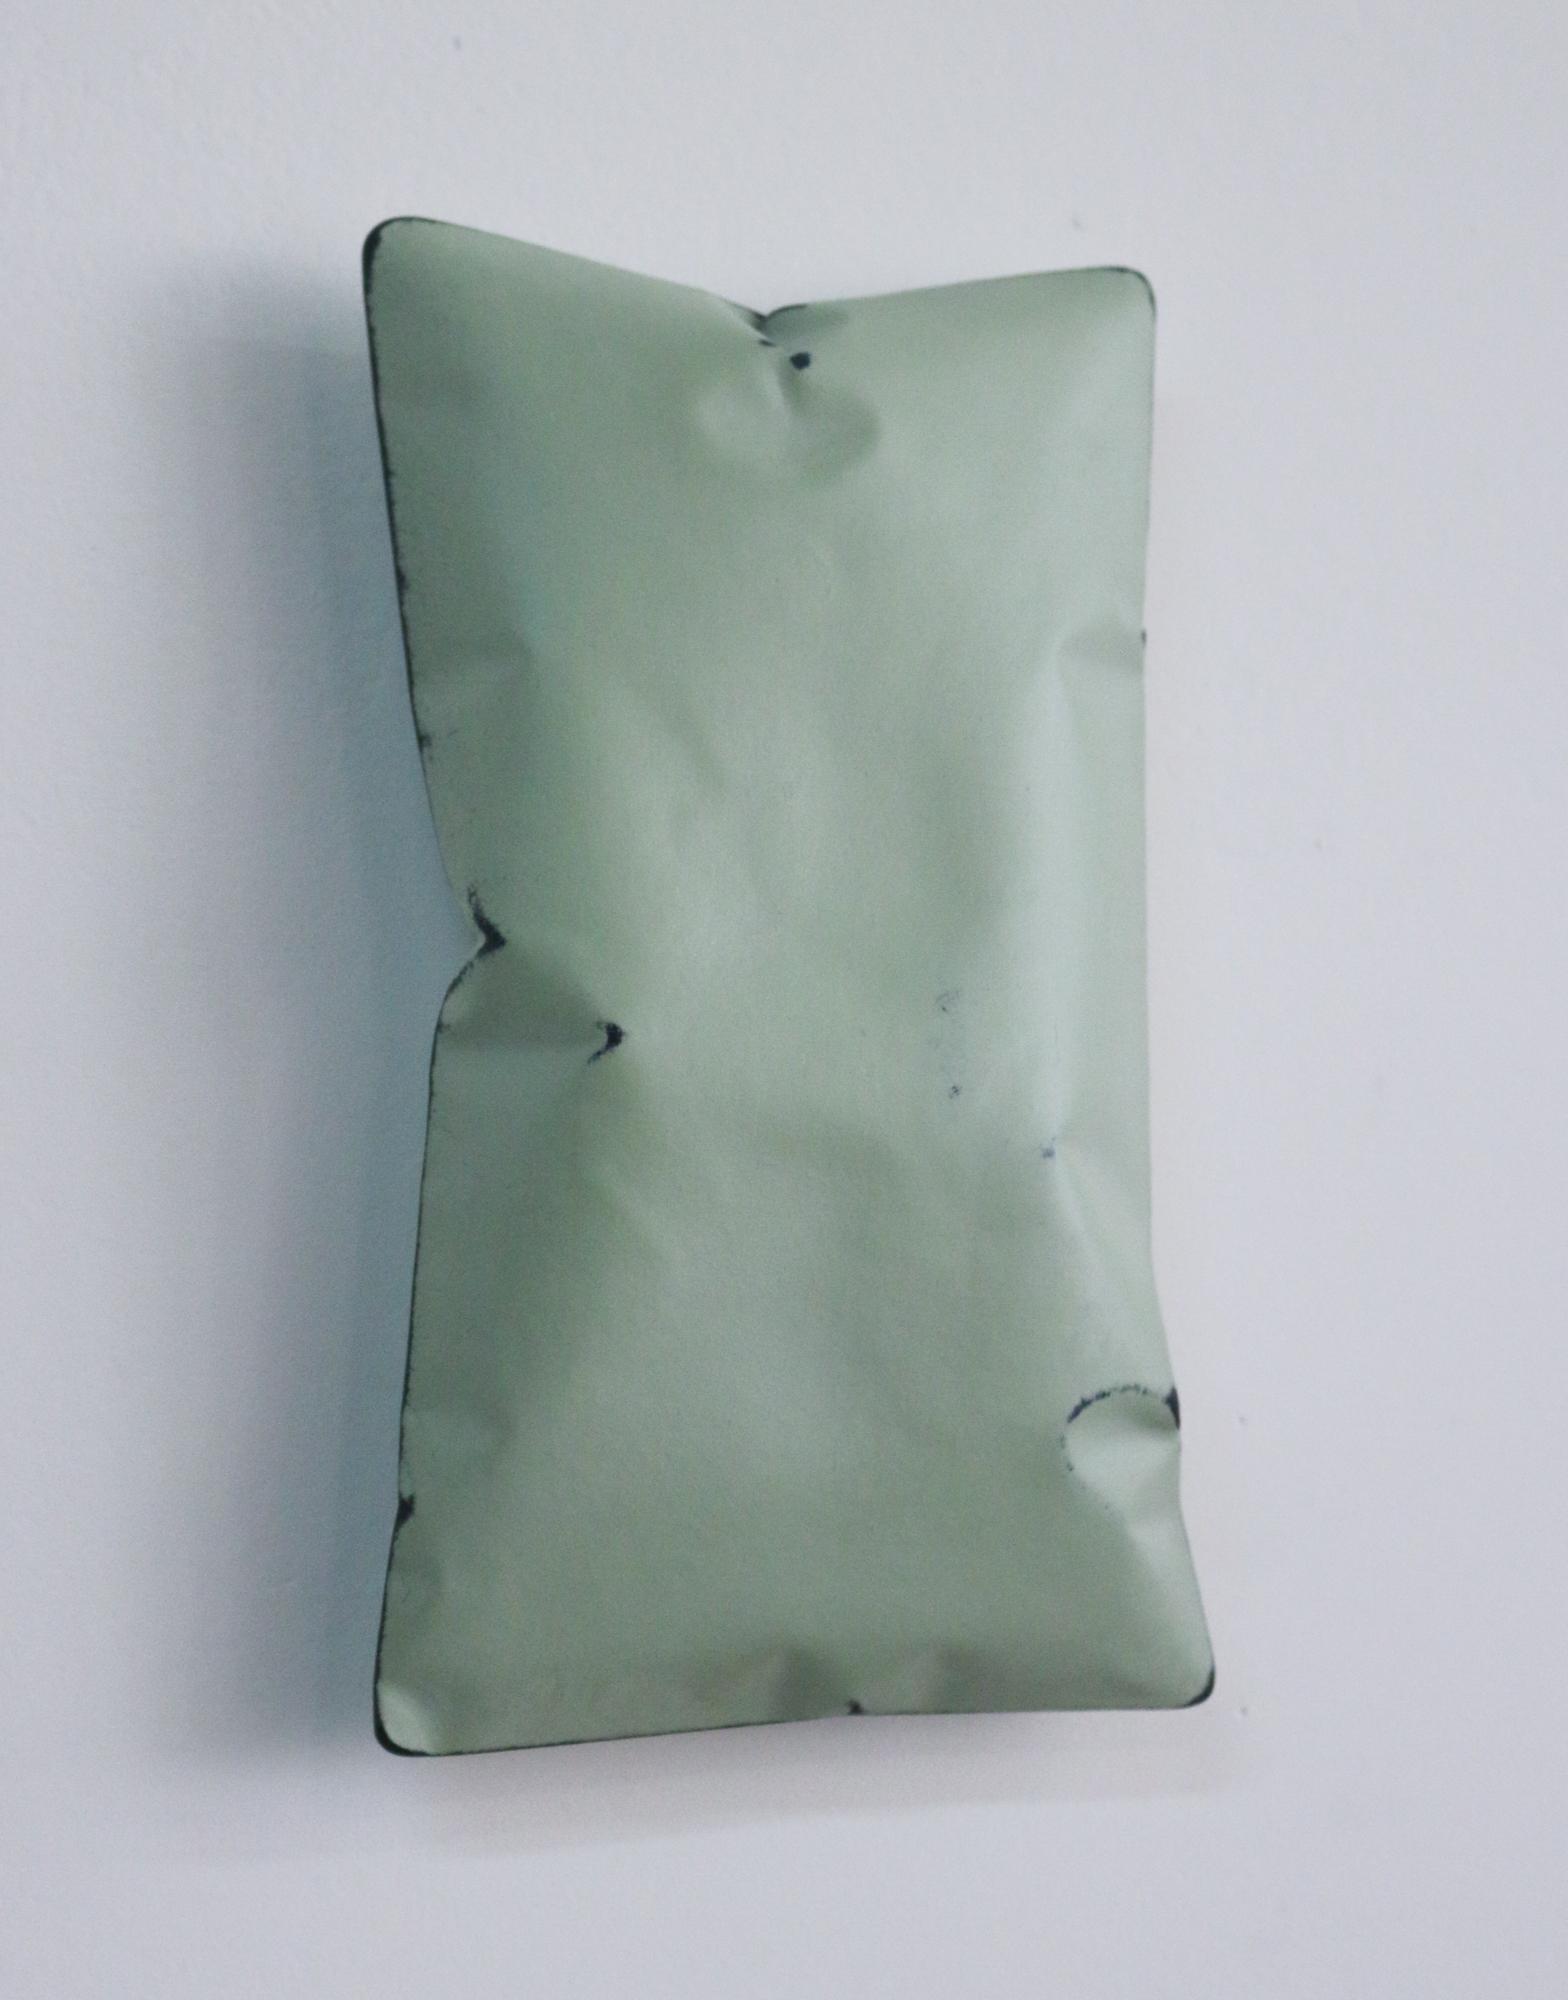 Johan De Wit, Untitled, 2018, Paper, Resin, Marble, Acrylic, 25 x 15 x 5 cm, Affinity Art